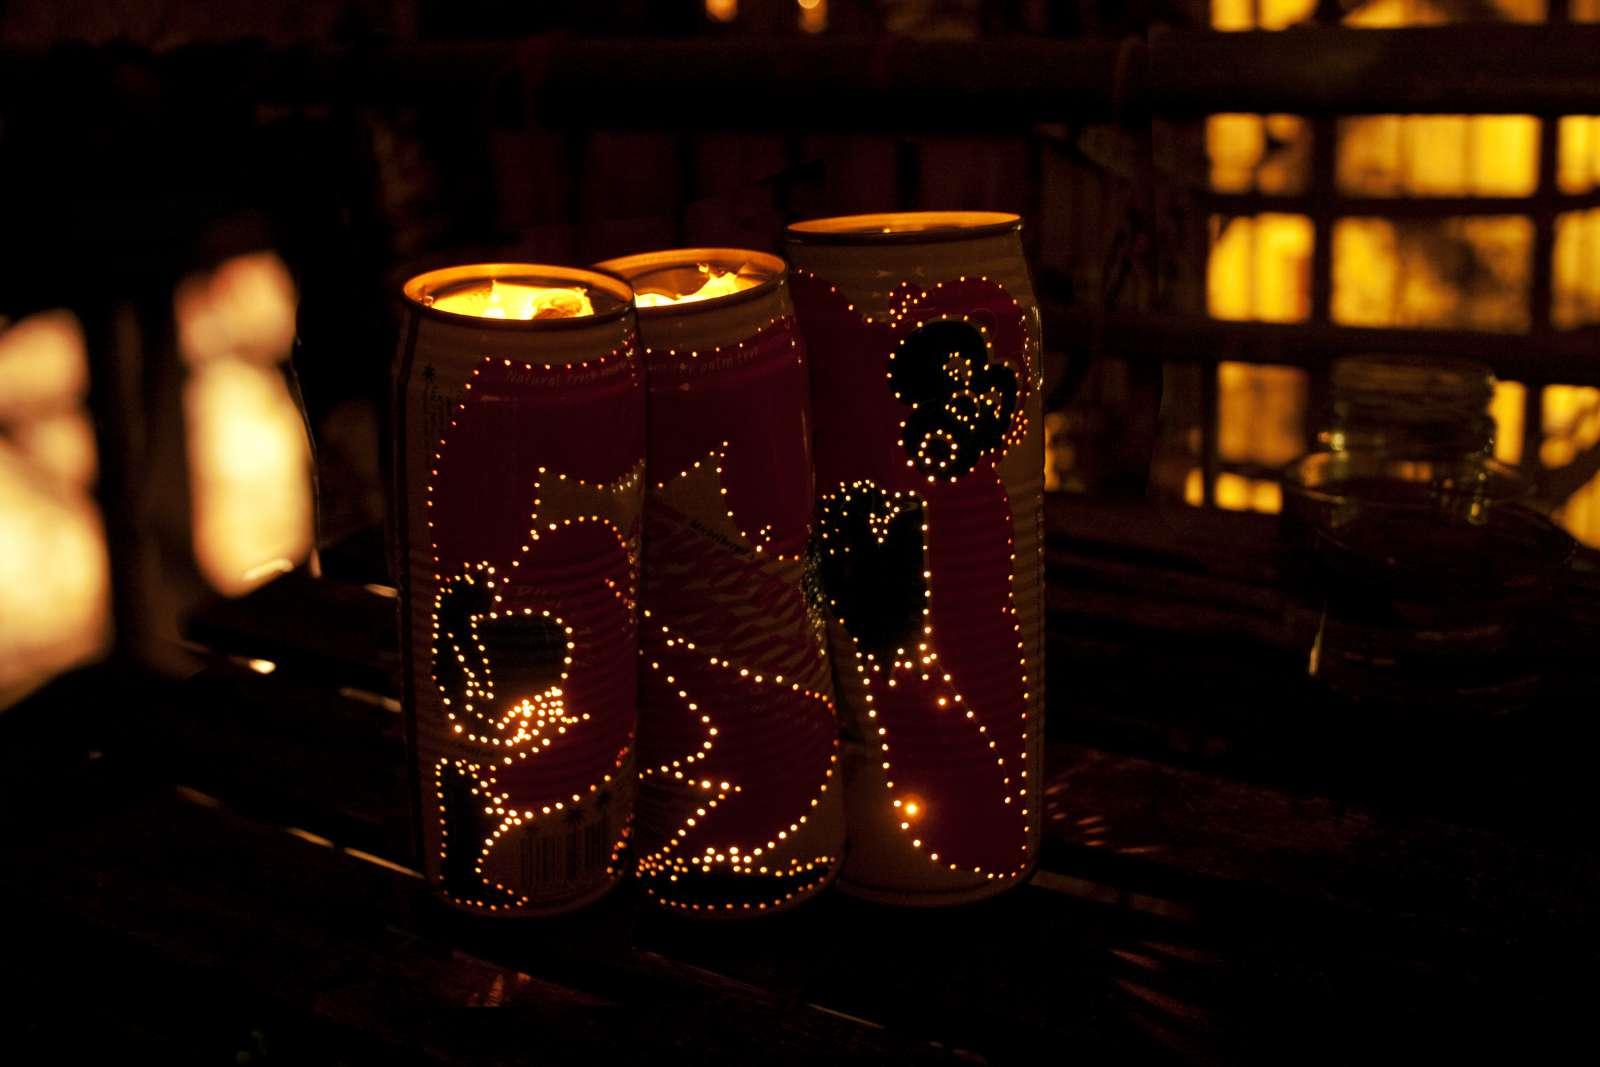 affenstarkes Jungbrunnenlicht